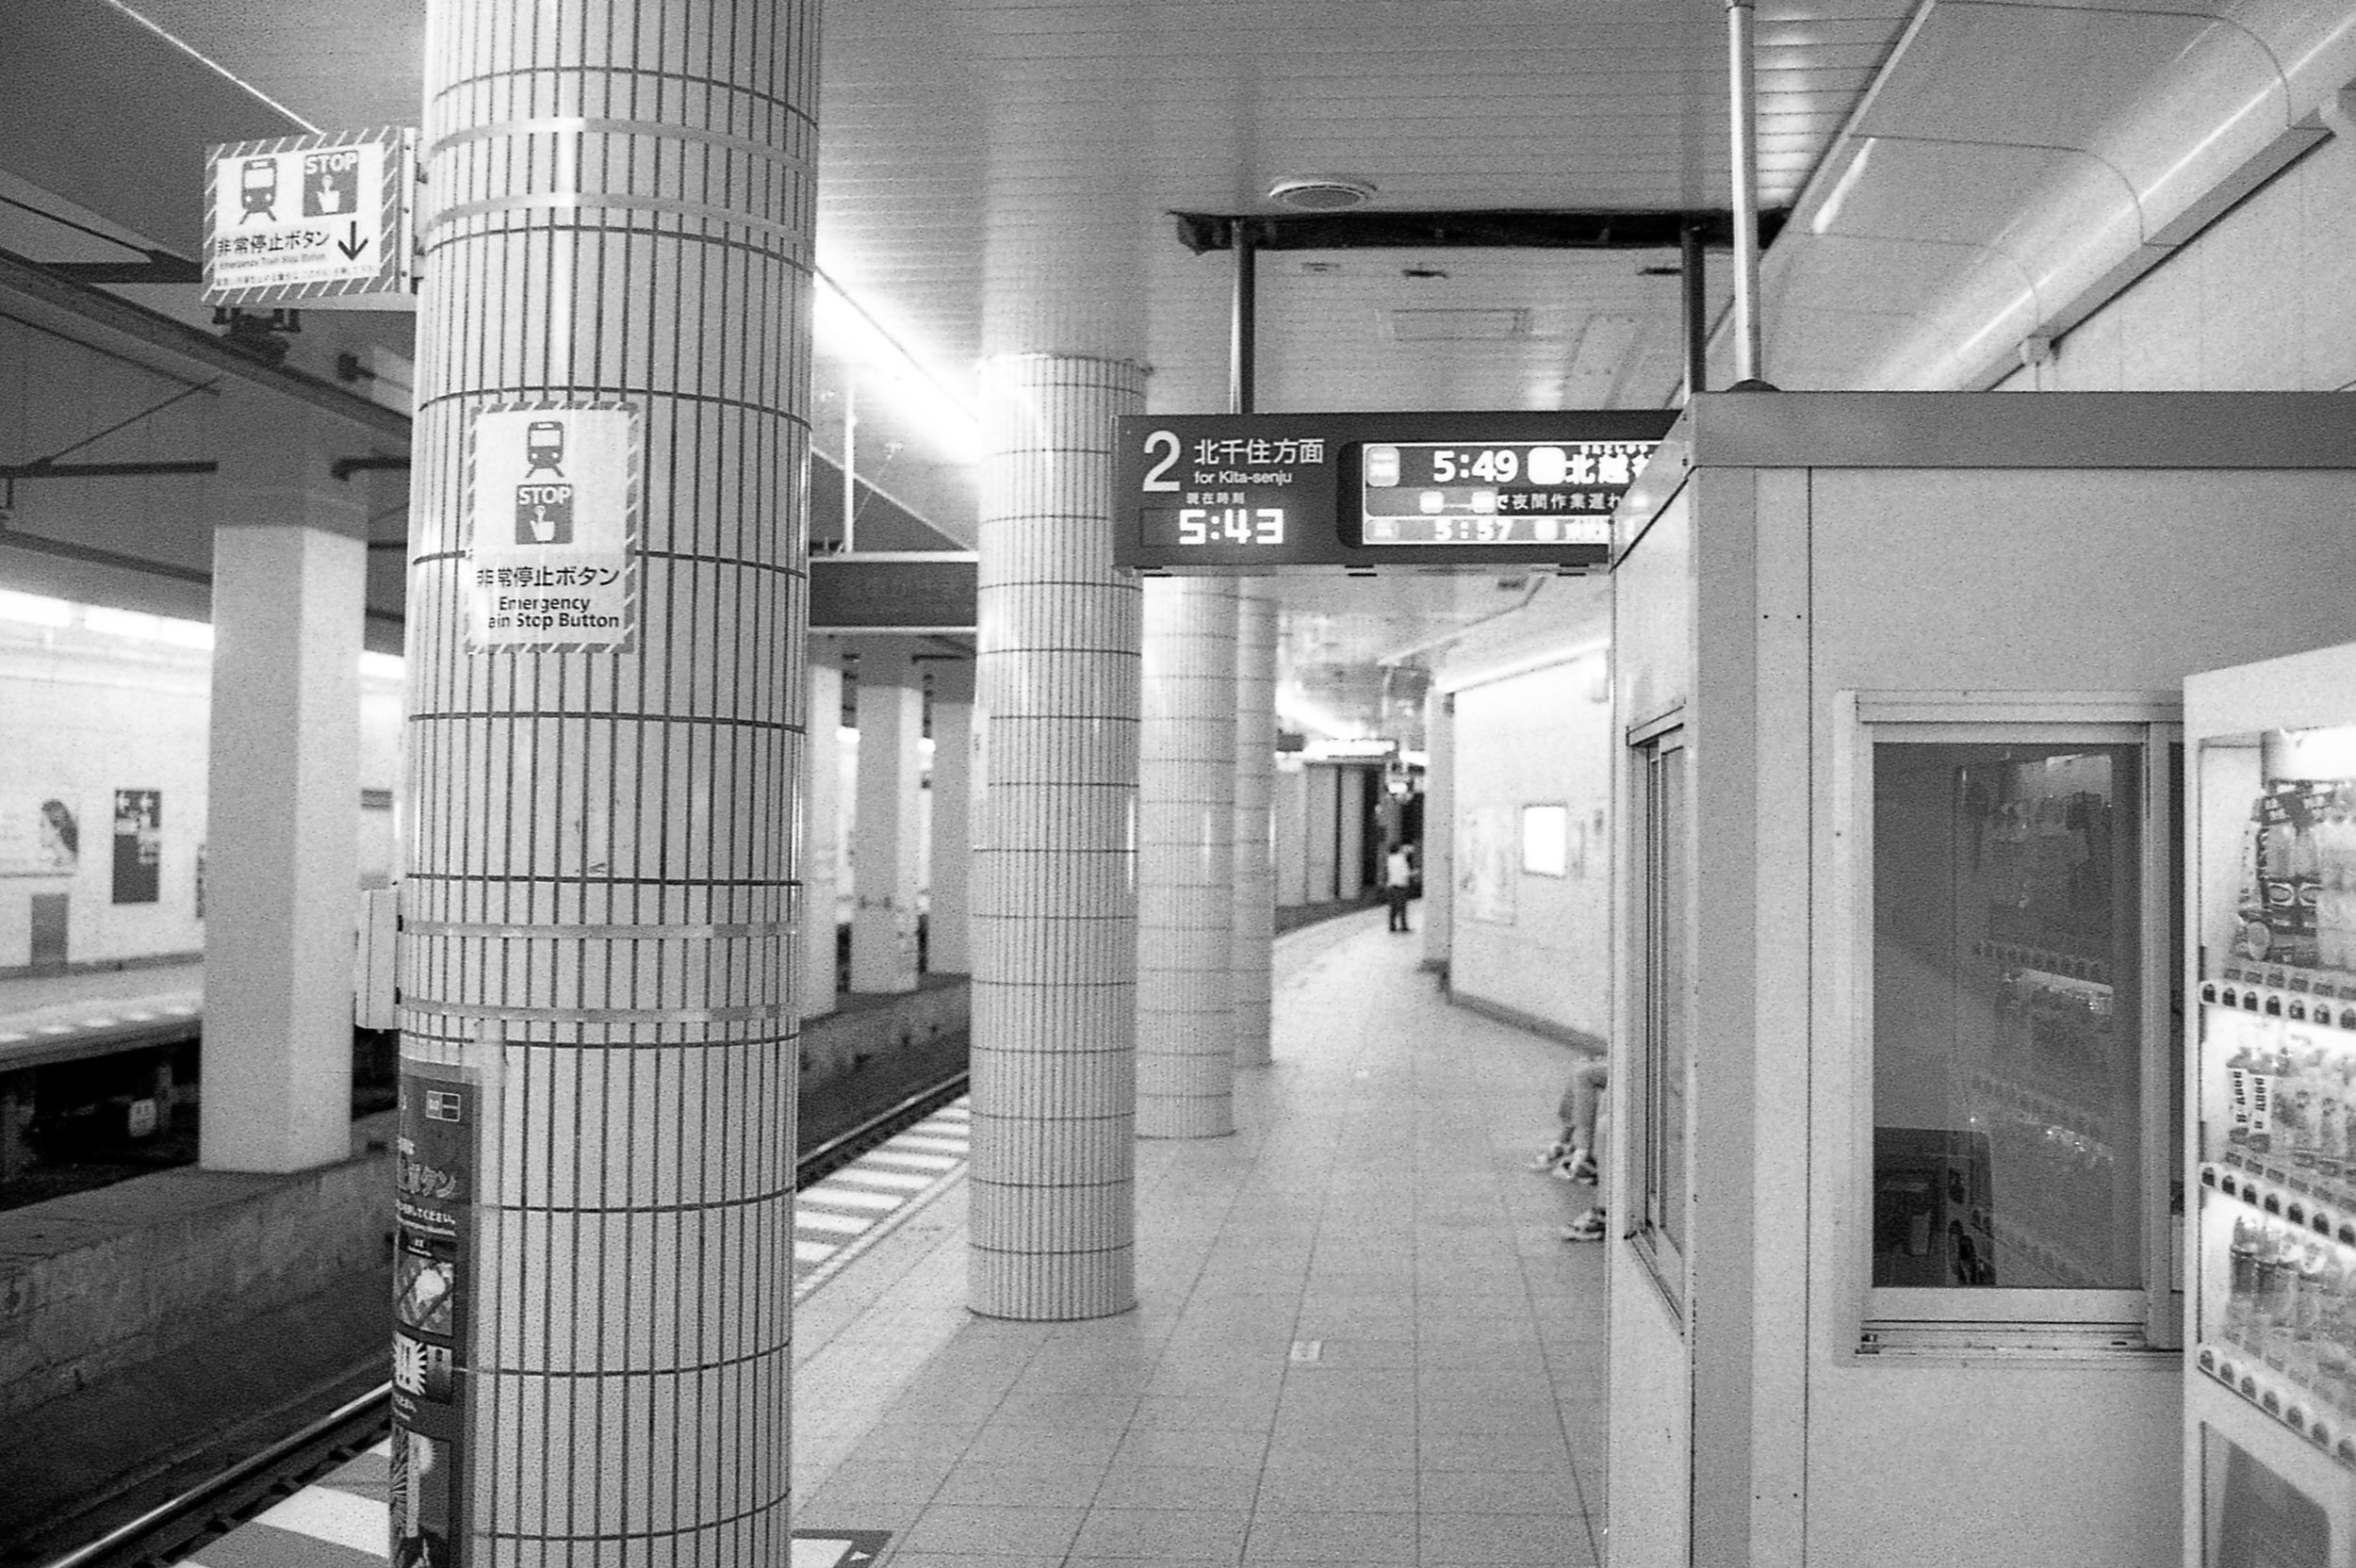 20180827_29_Hiroshima_014.jpg